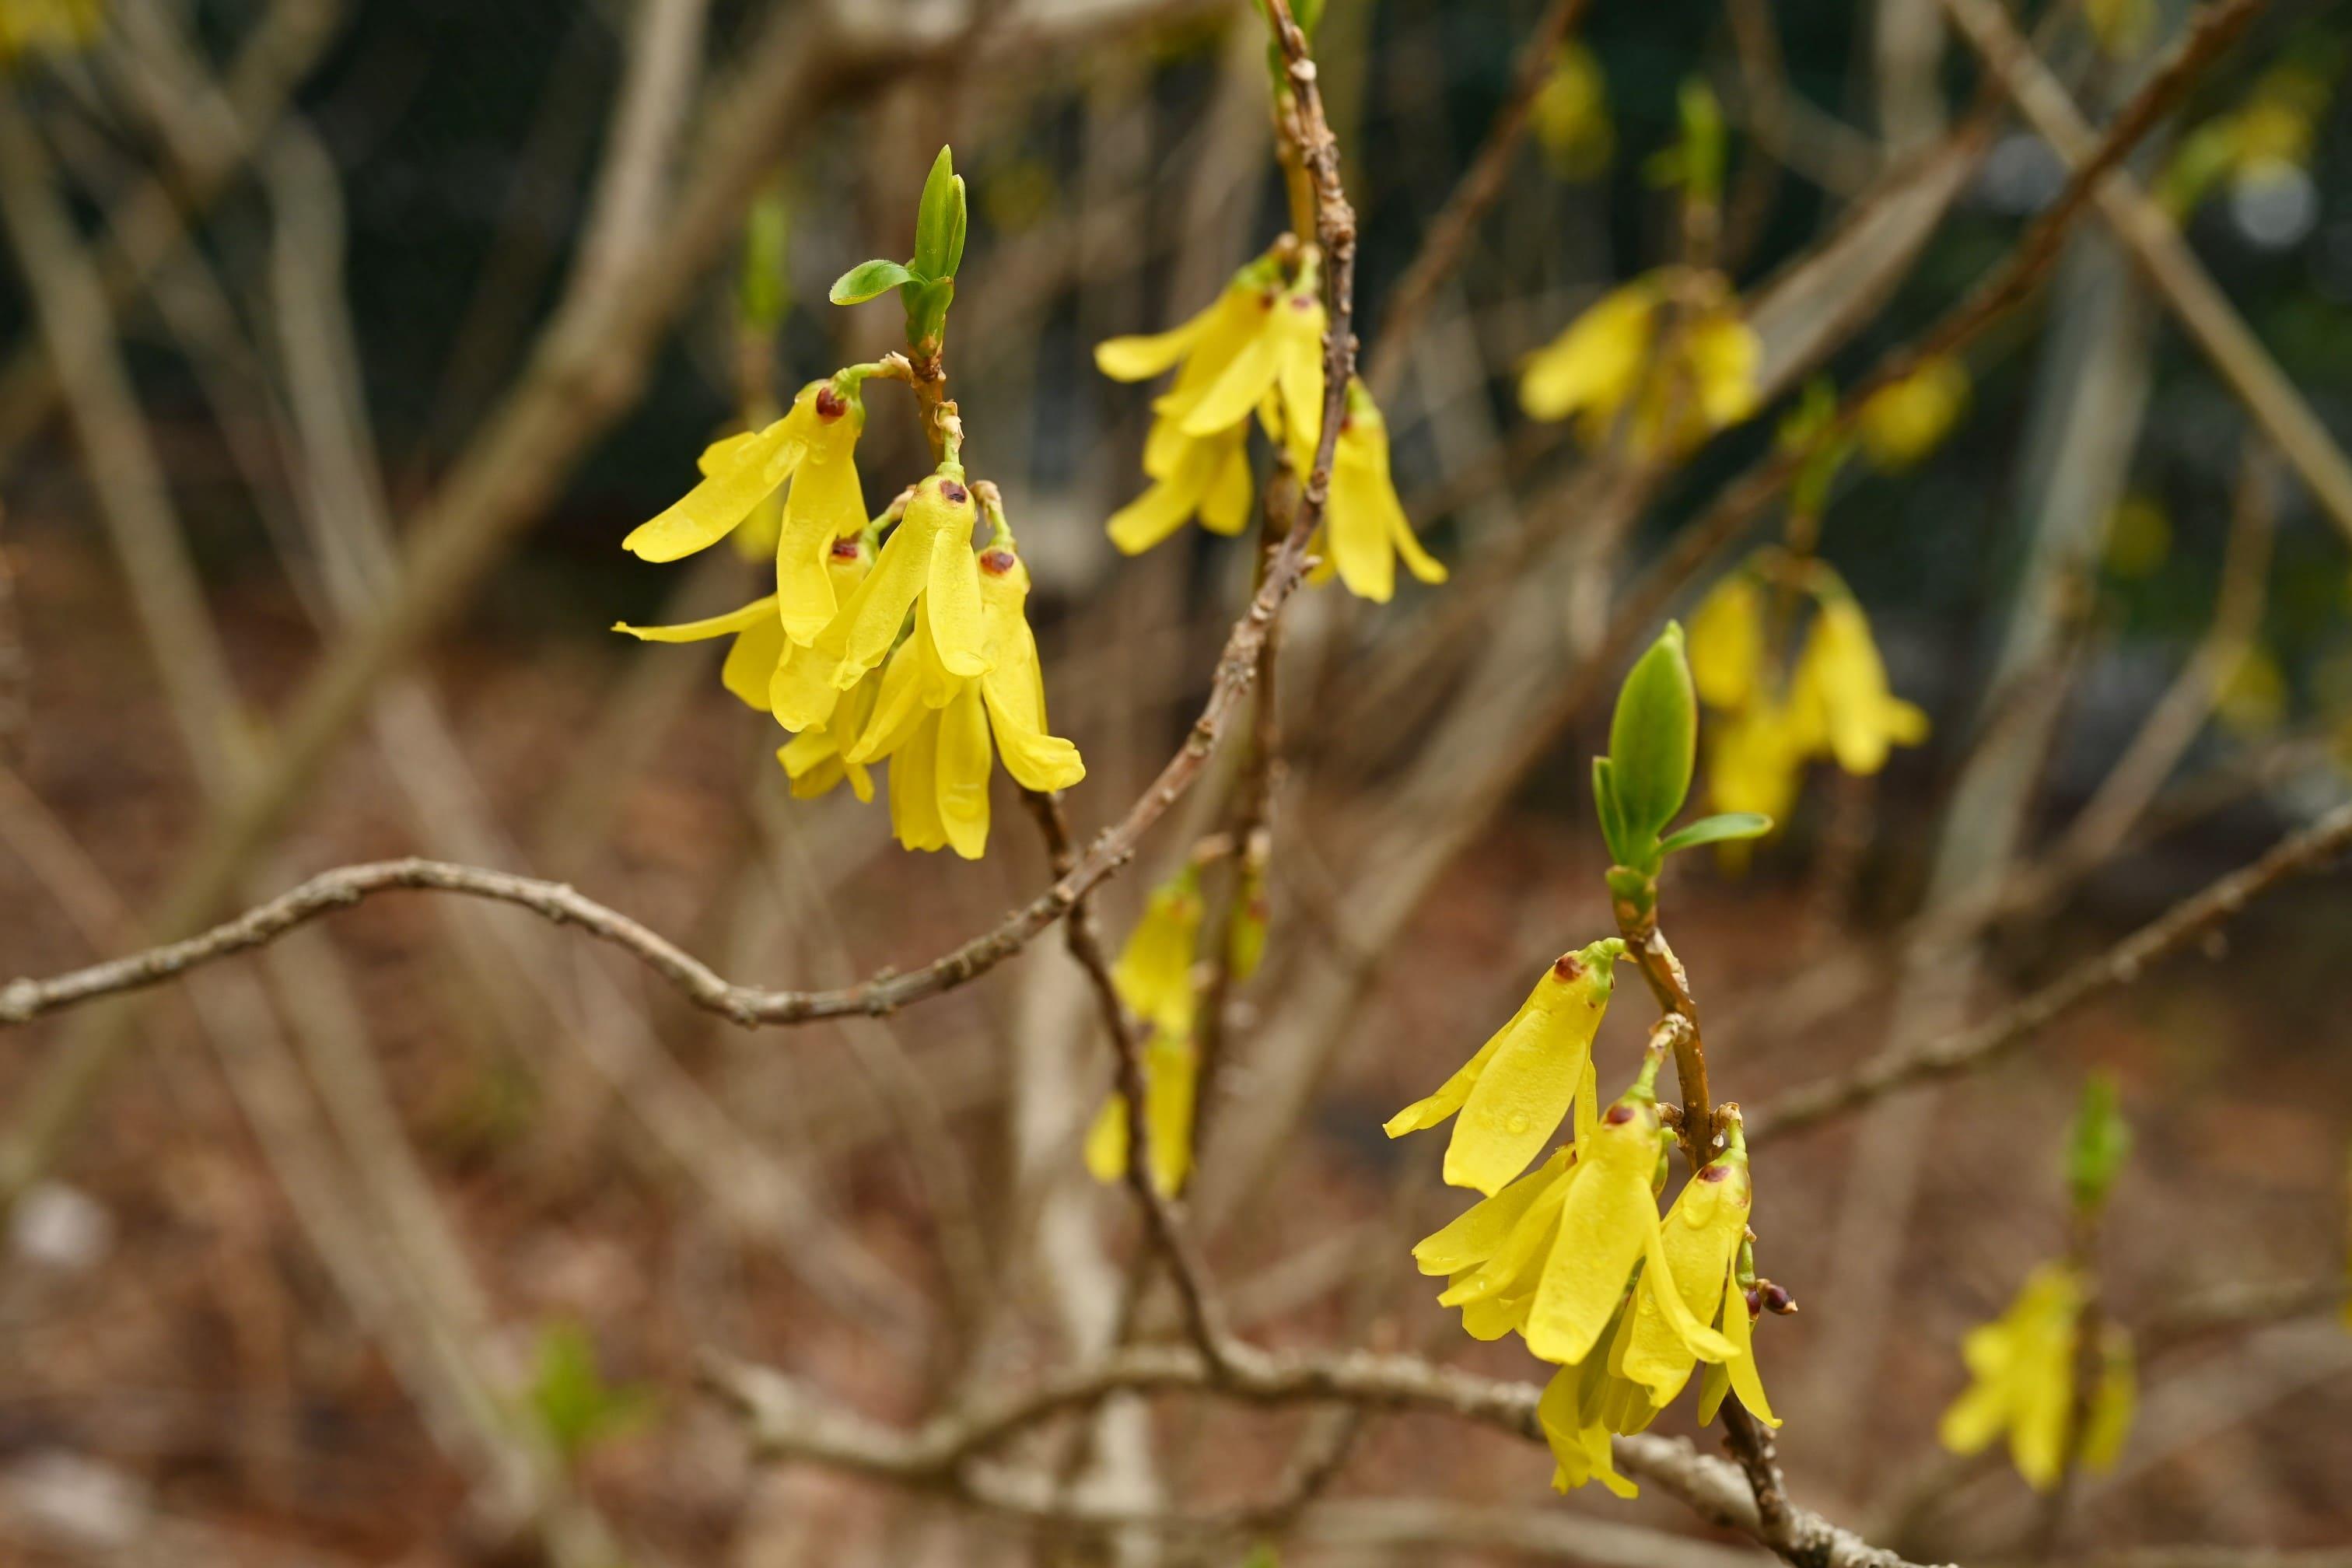 Golden bell flowers in Japan